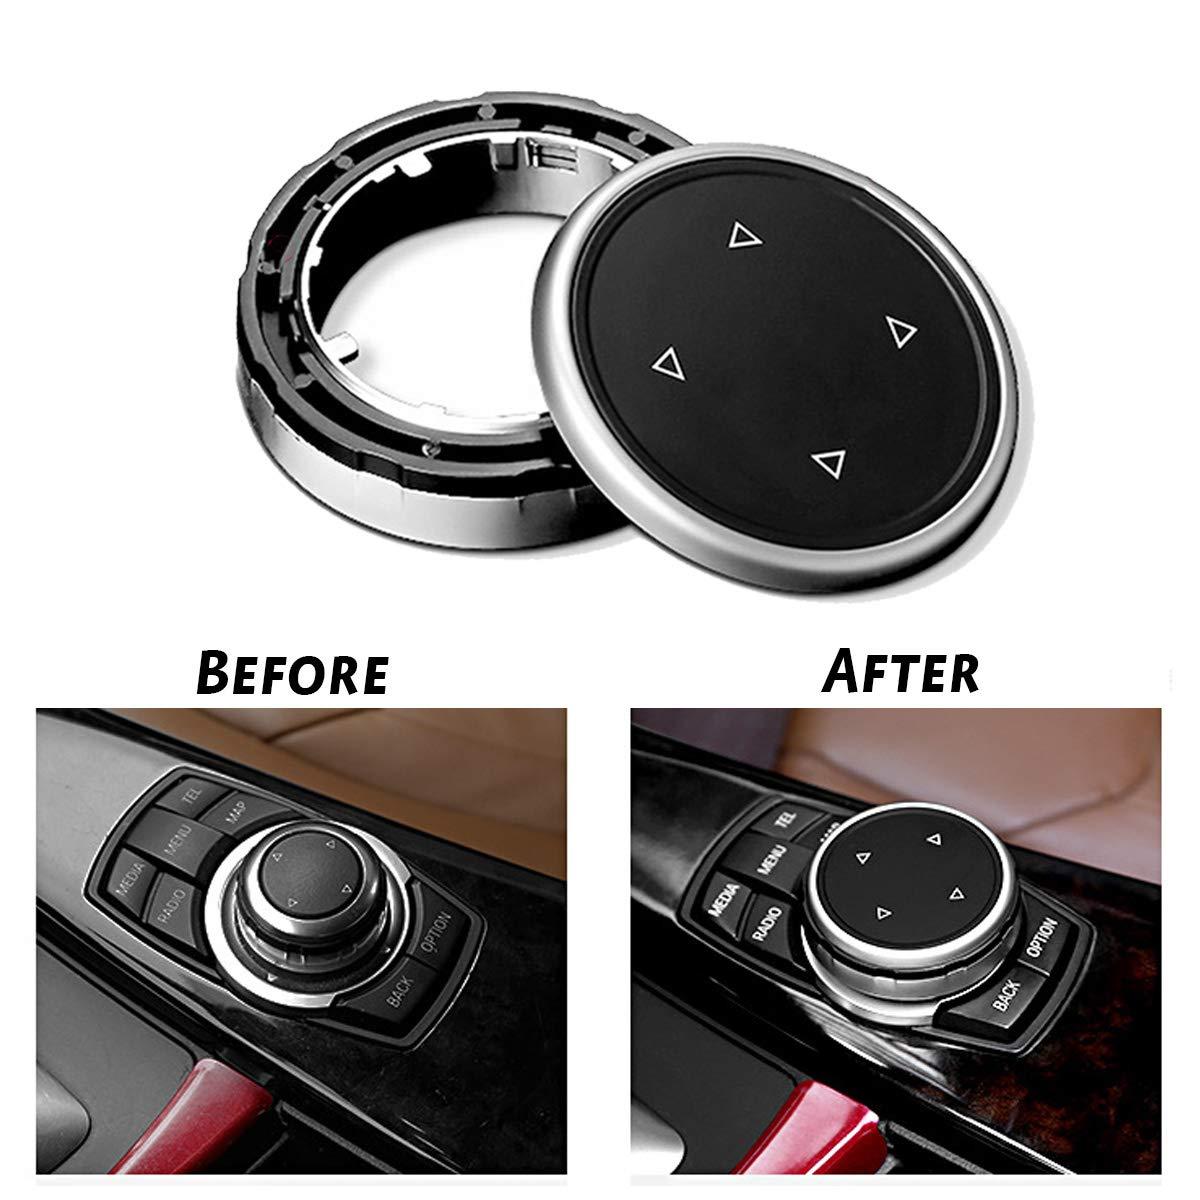 MASO per Vari Tipi di Pulsanti iDrive Cover per Pulsanti multimediali per Auto per X1 X3 X5 X6 X4 e 1 2 3 5 7Series